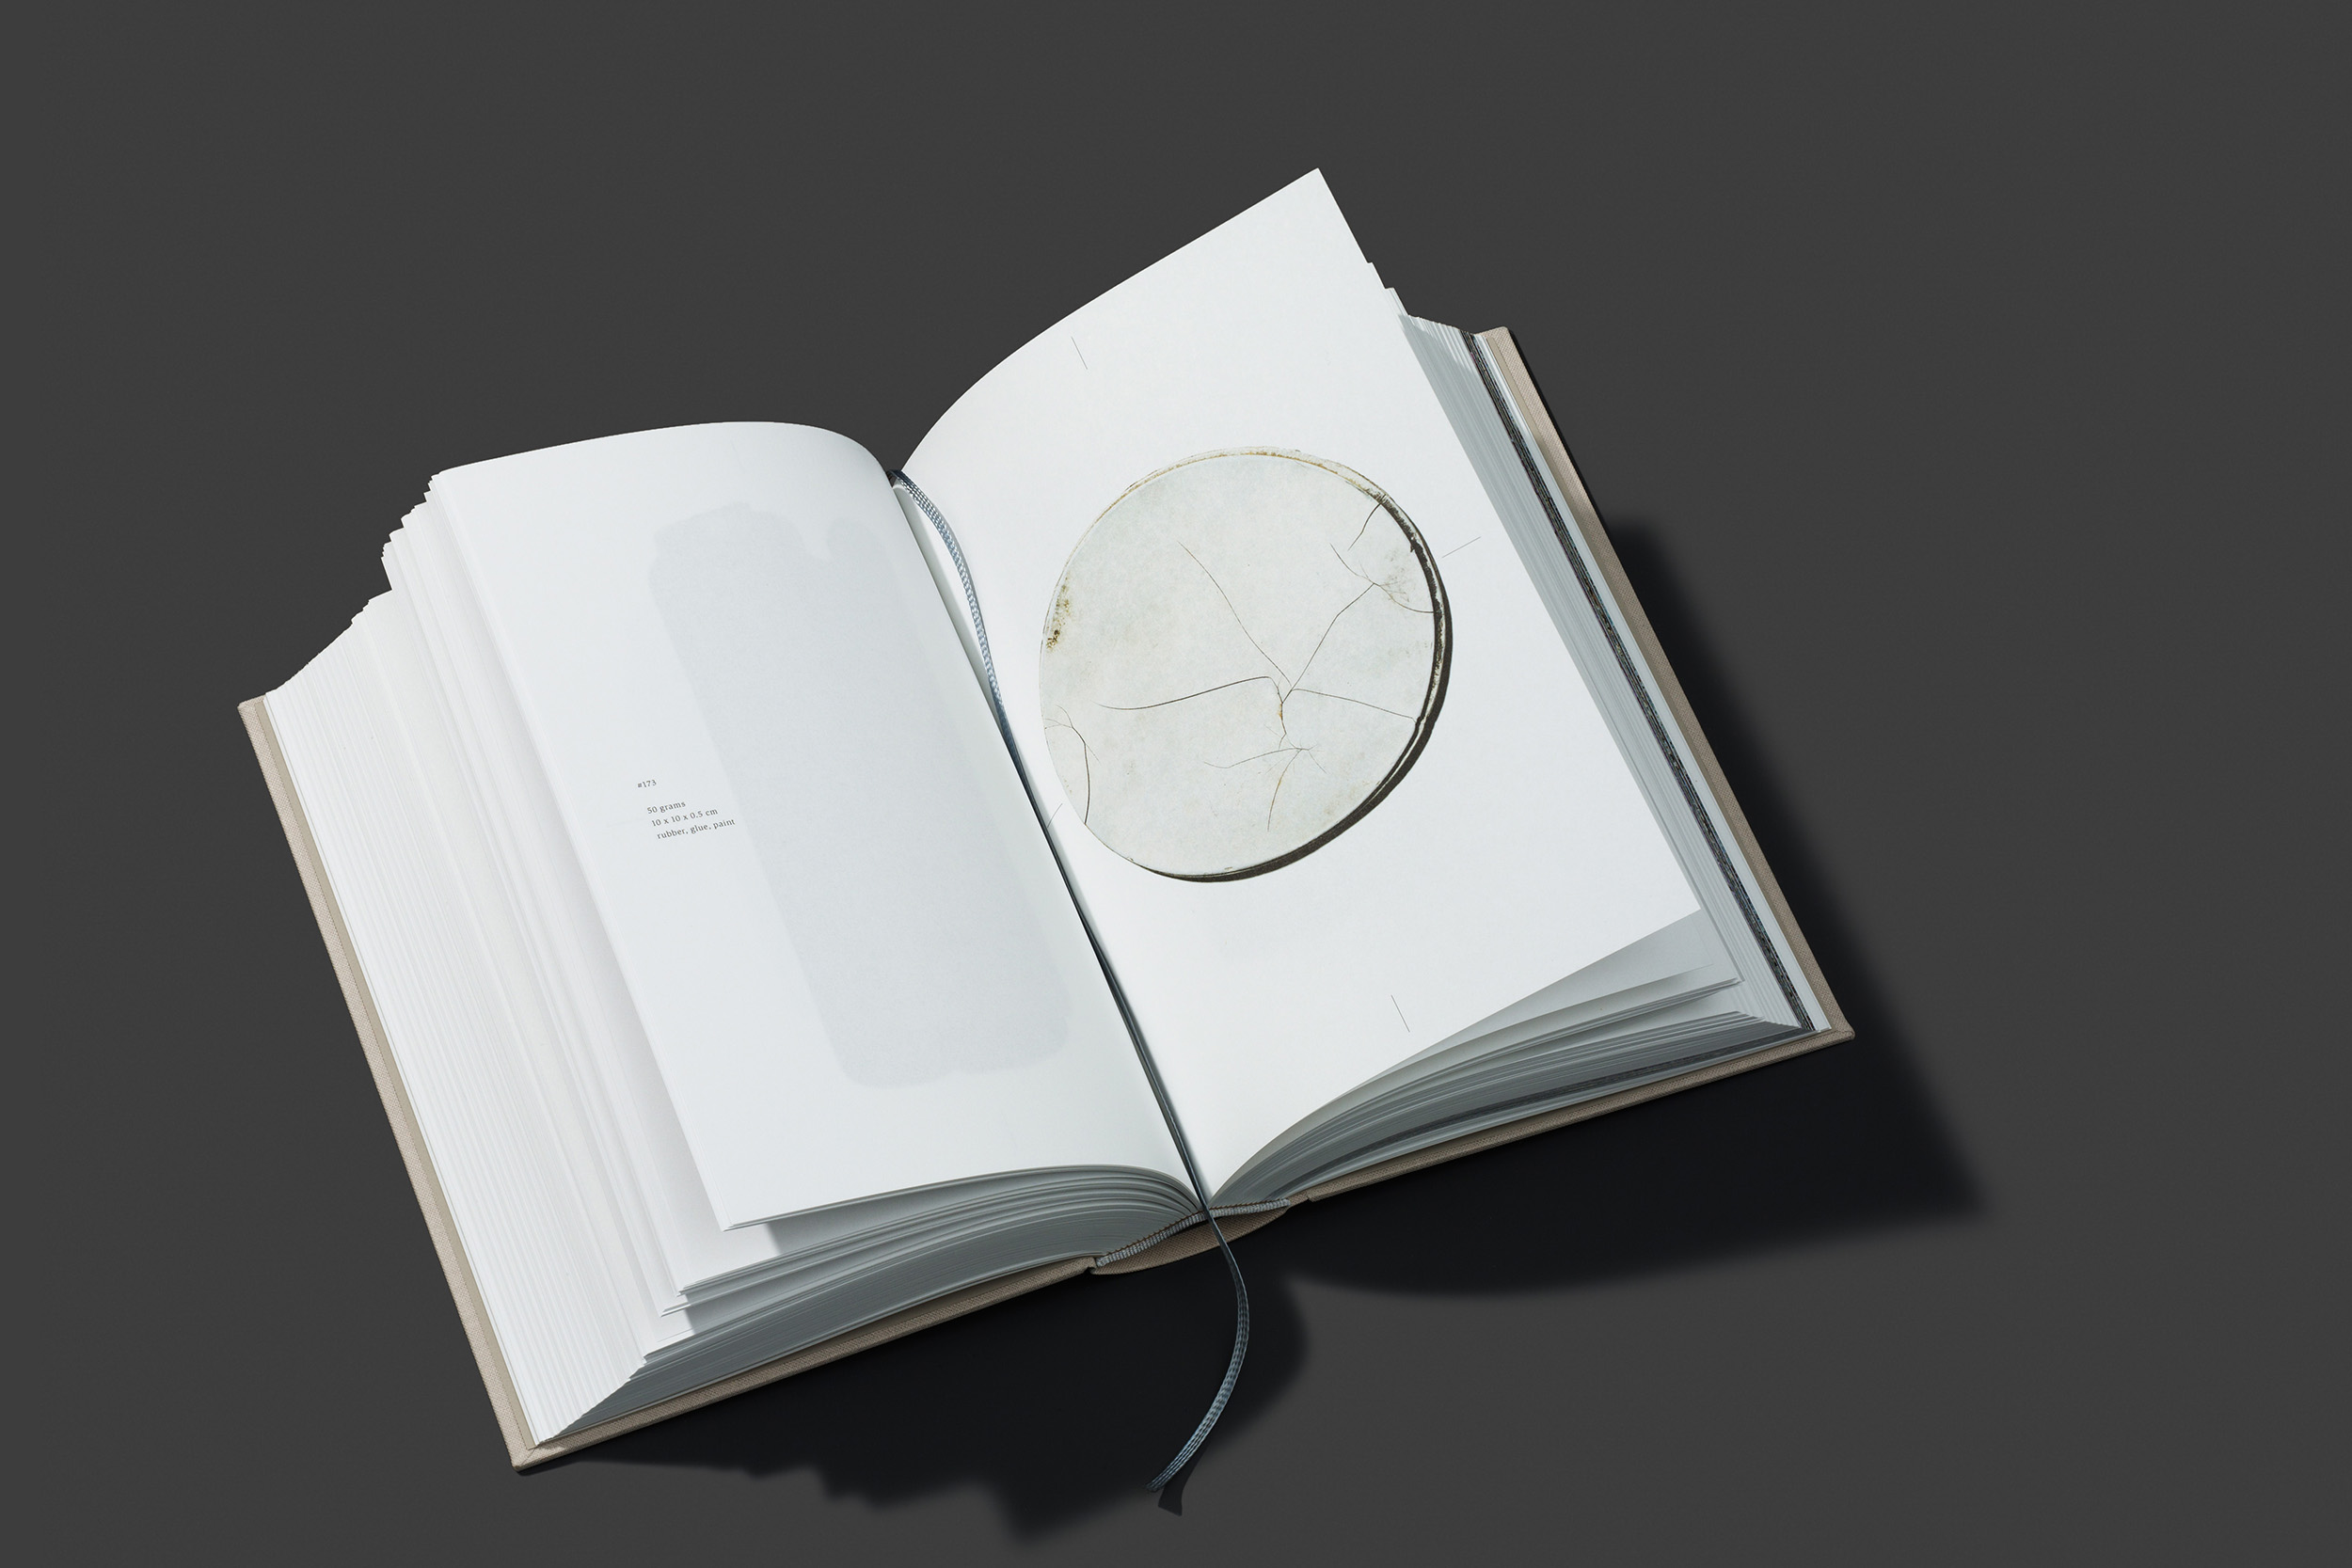 worthless_book_06.jpg